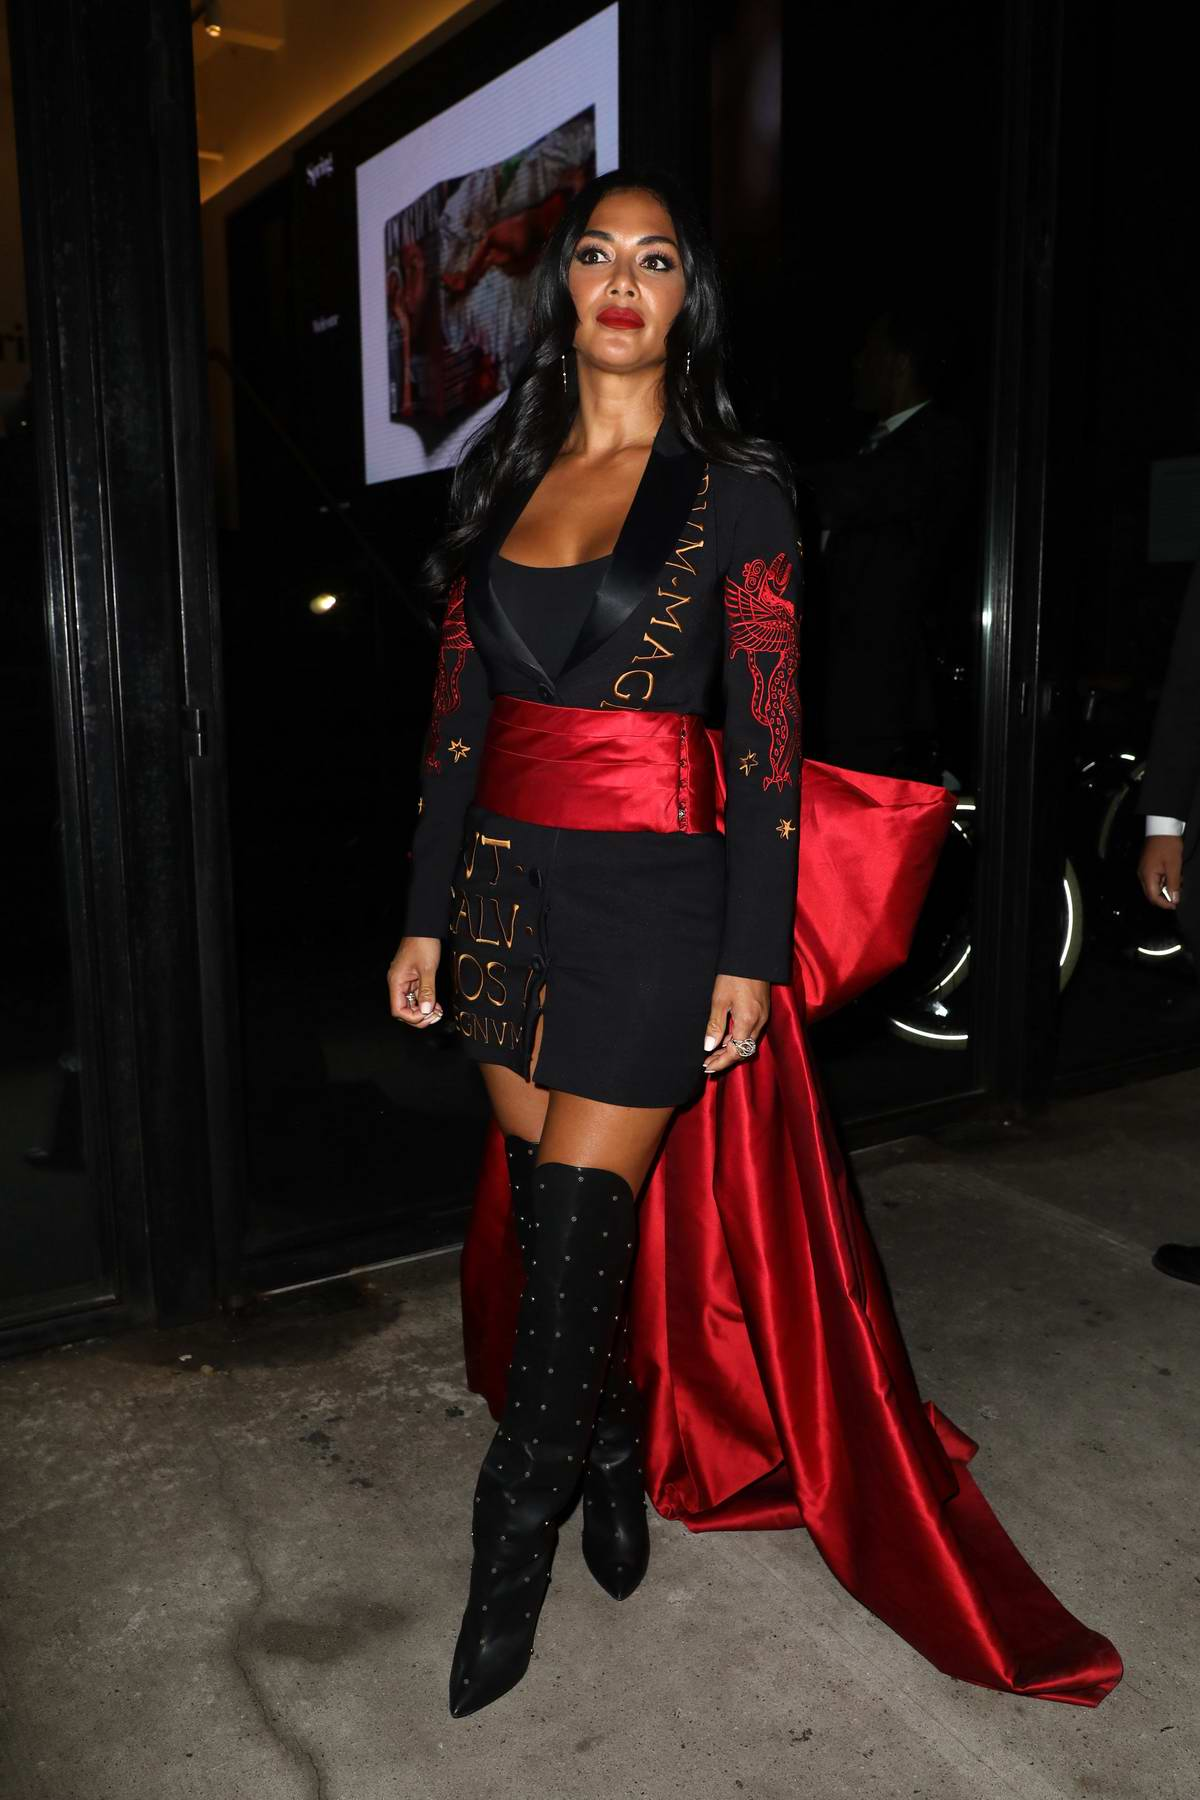 Nicole Scherzinger seen leaving the Jeremy Scott show during New York Fashion Week in New York City